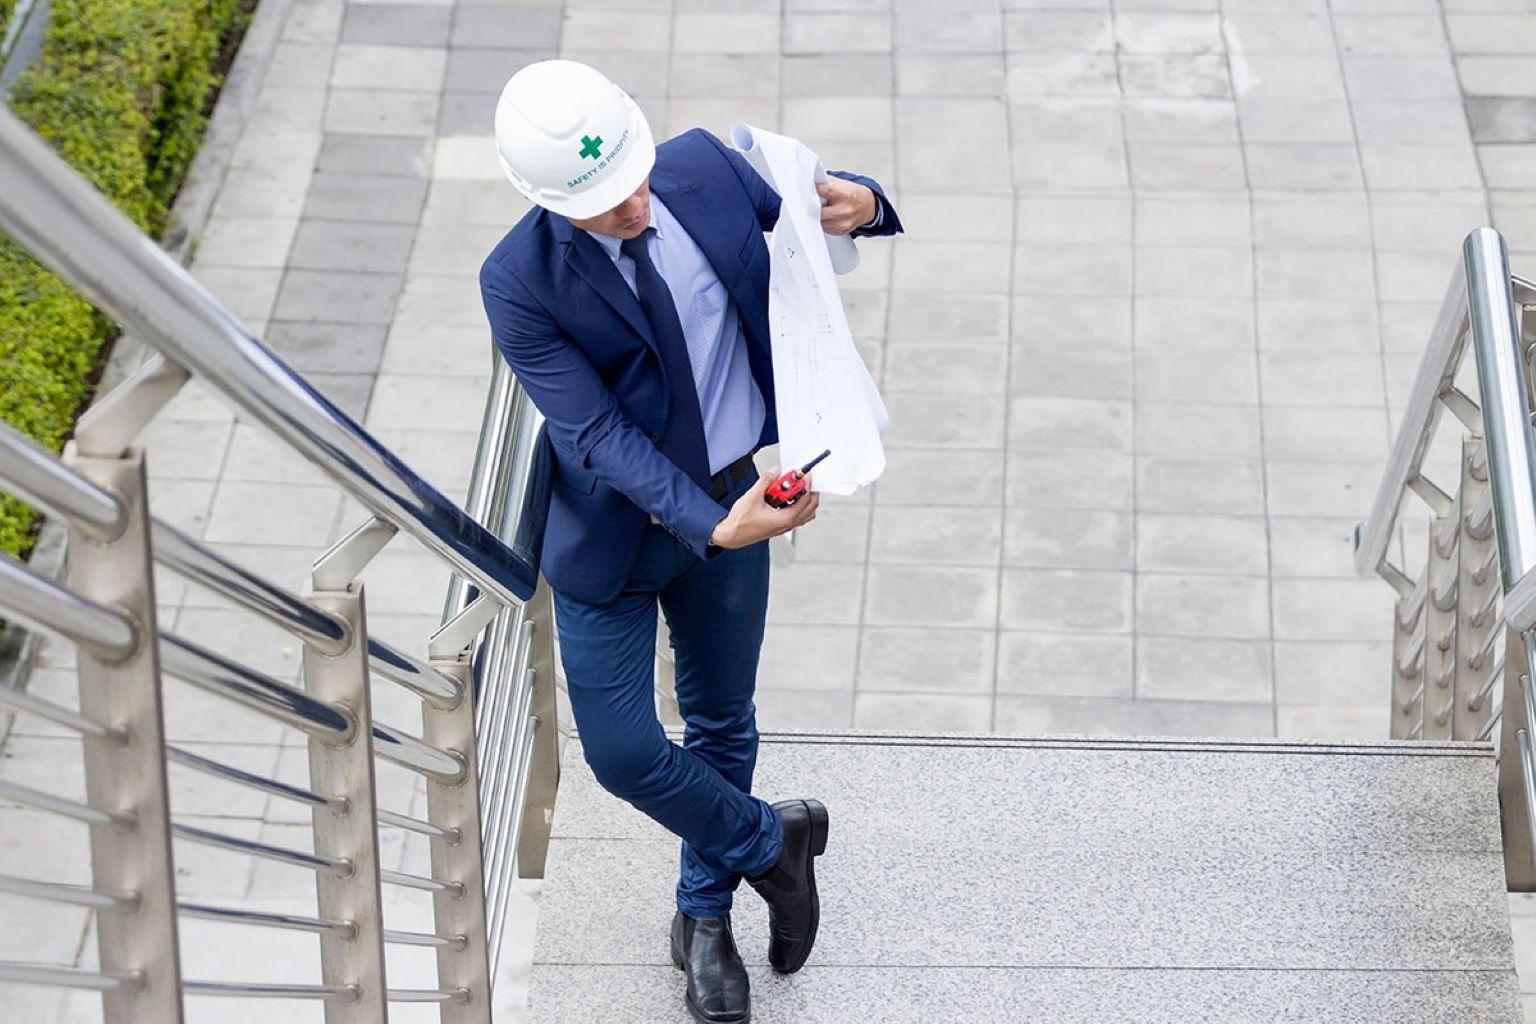 Work Health & Safety Law